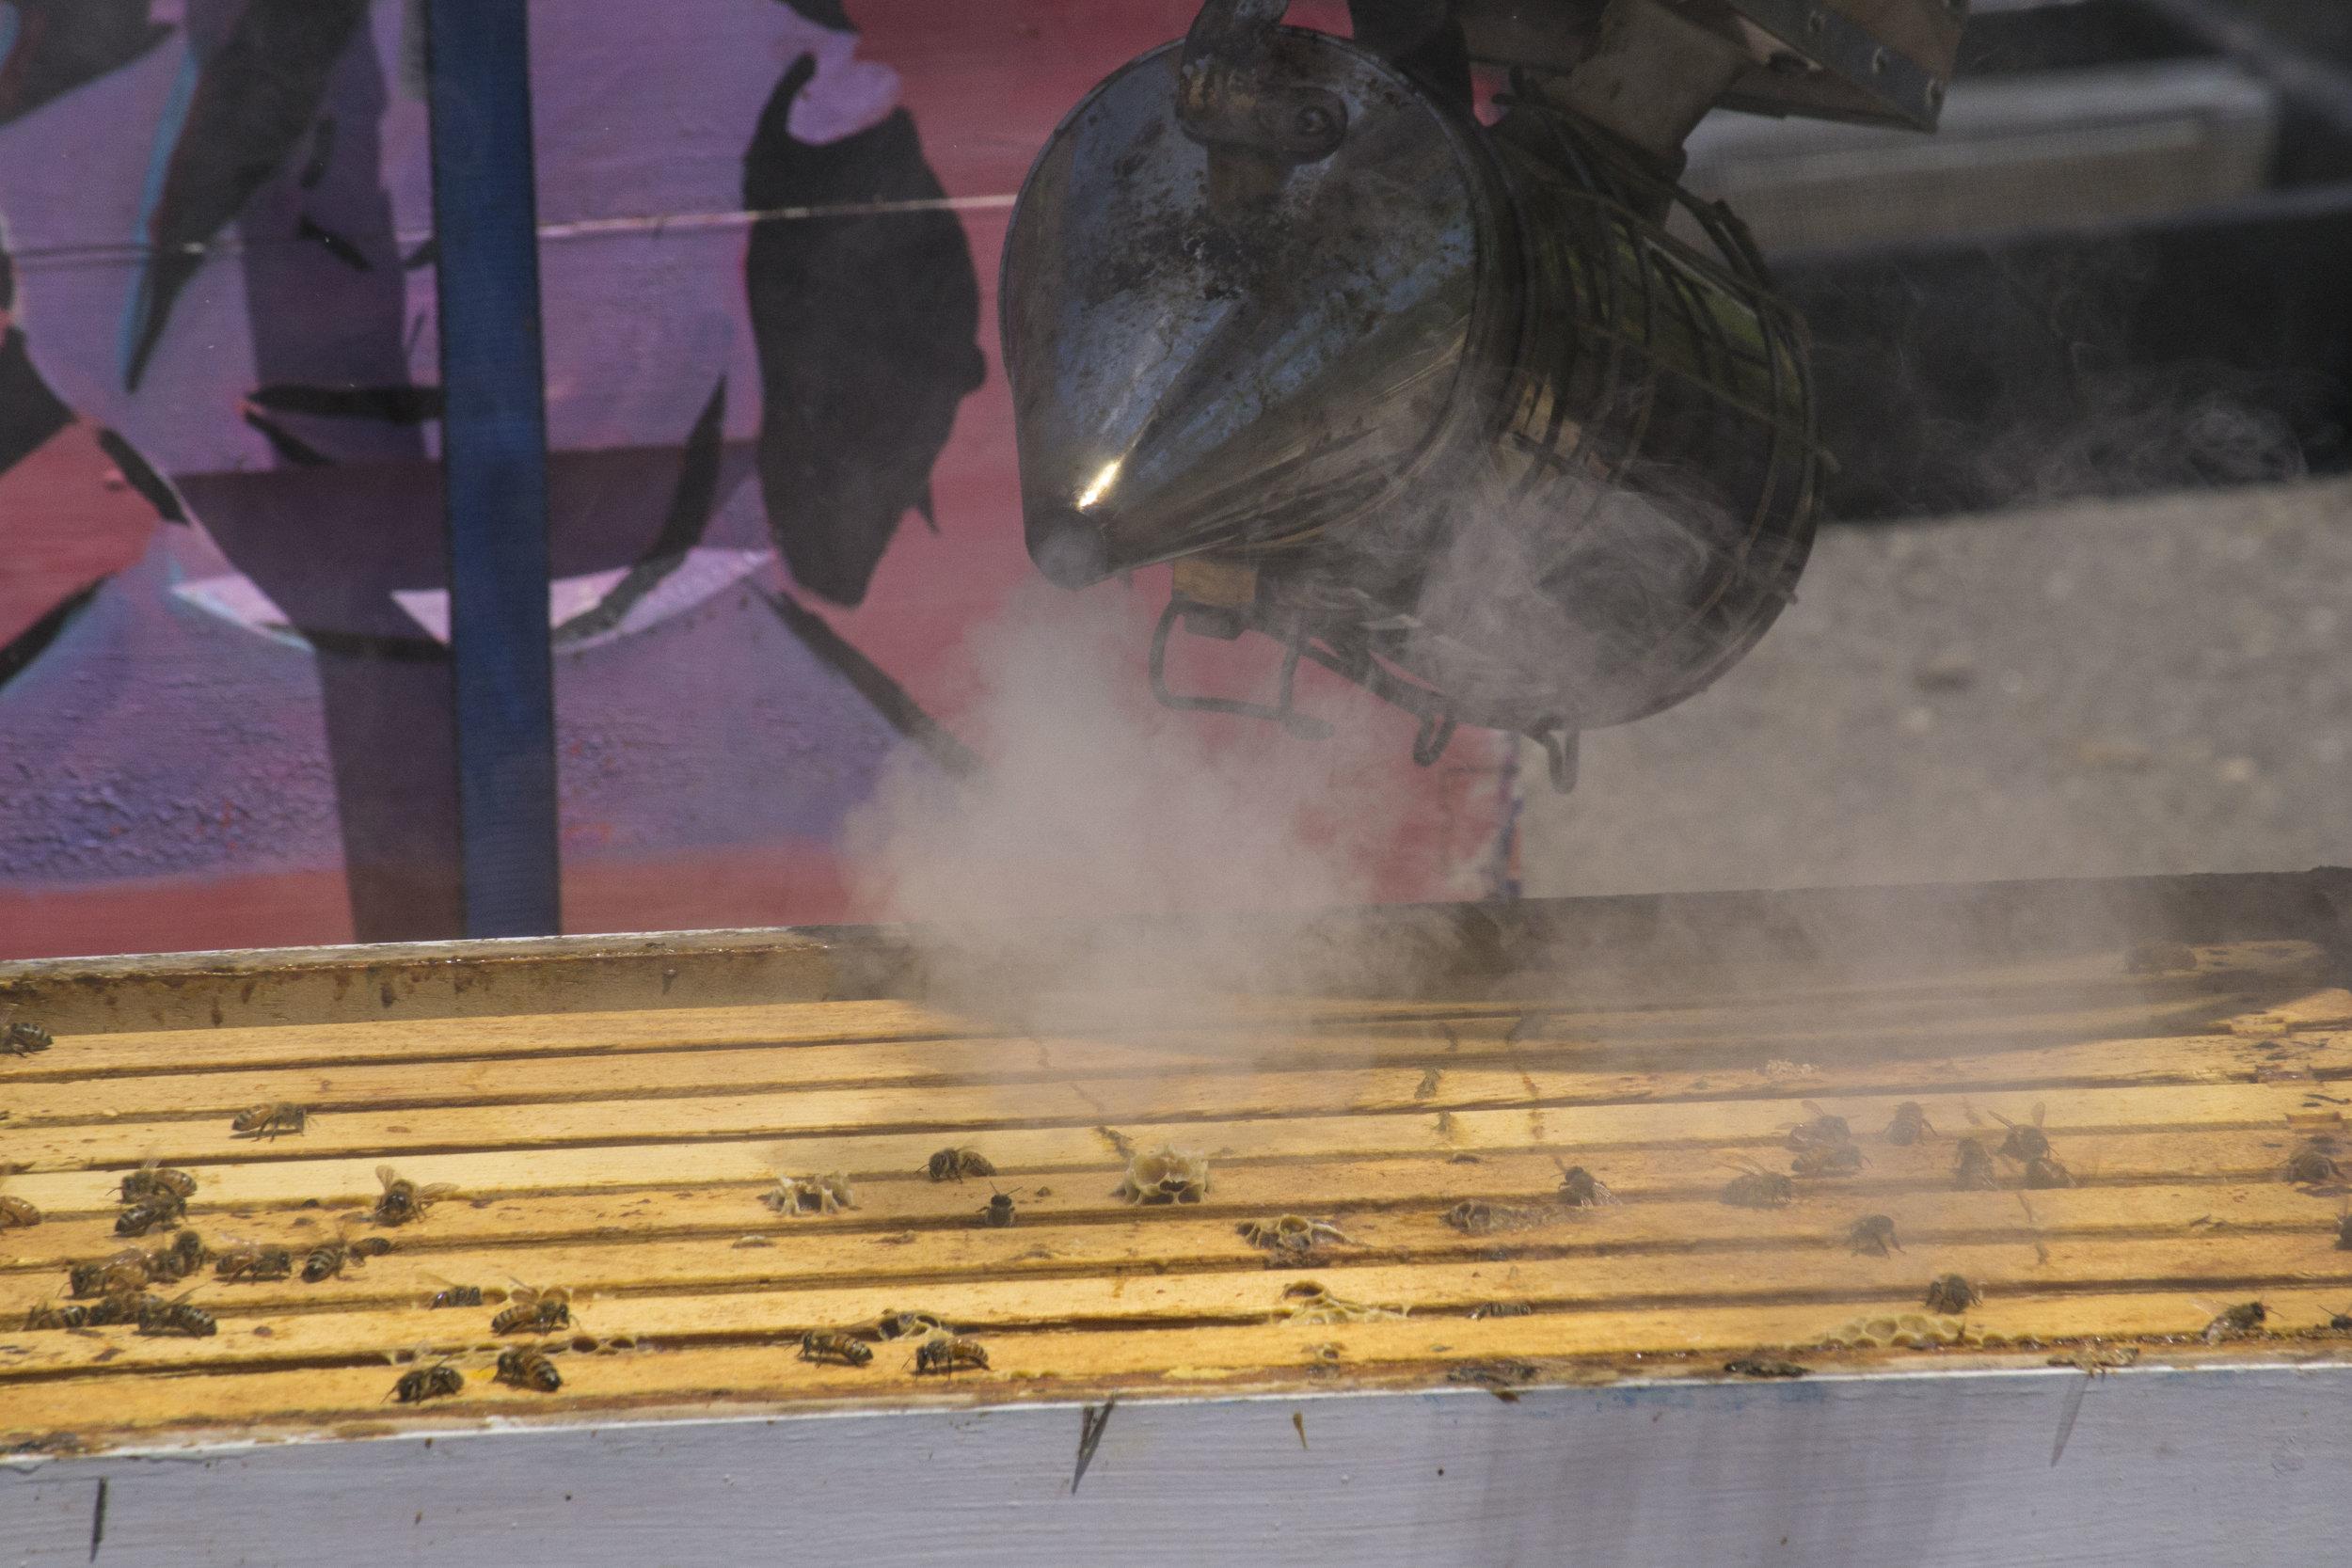 beekeeper1_32.jpg